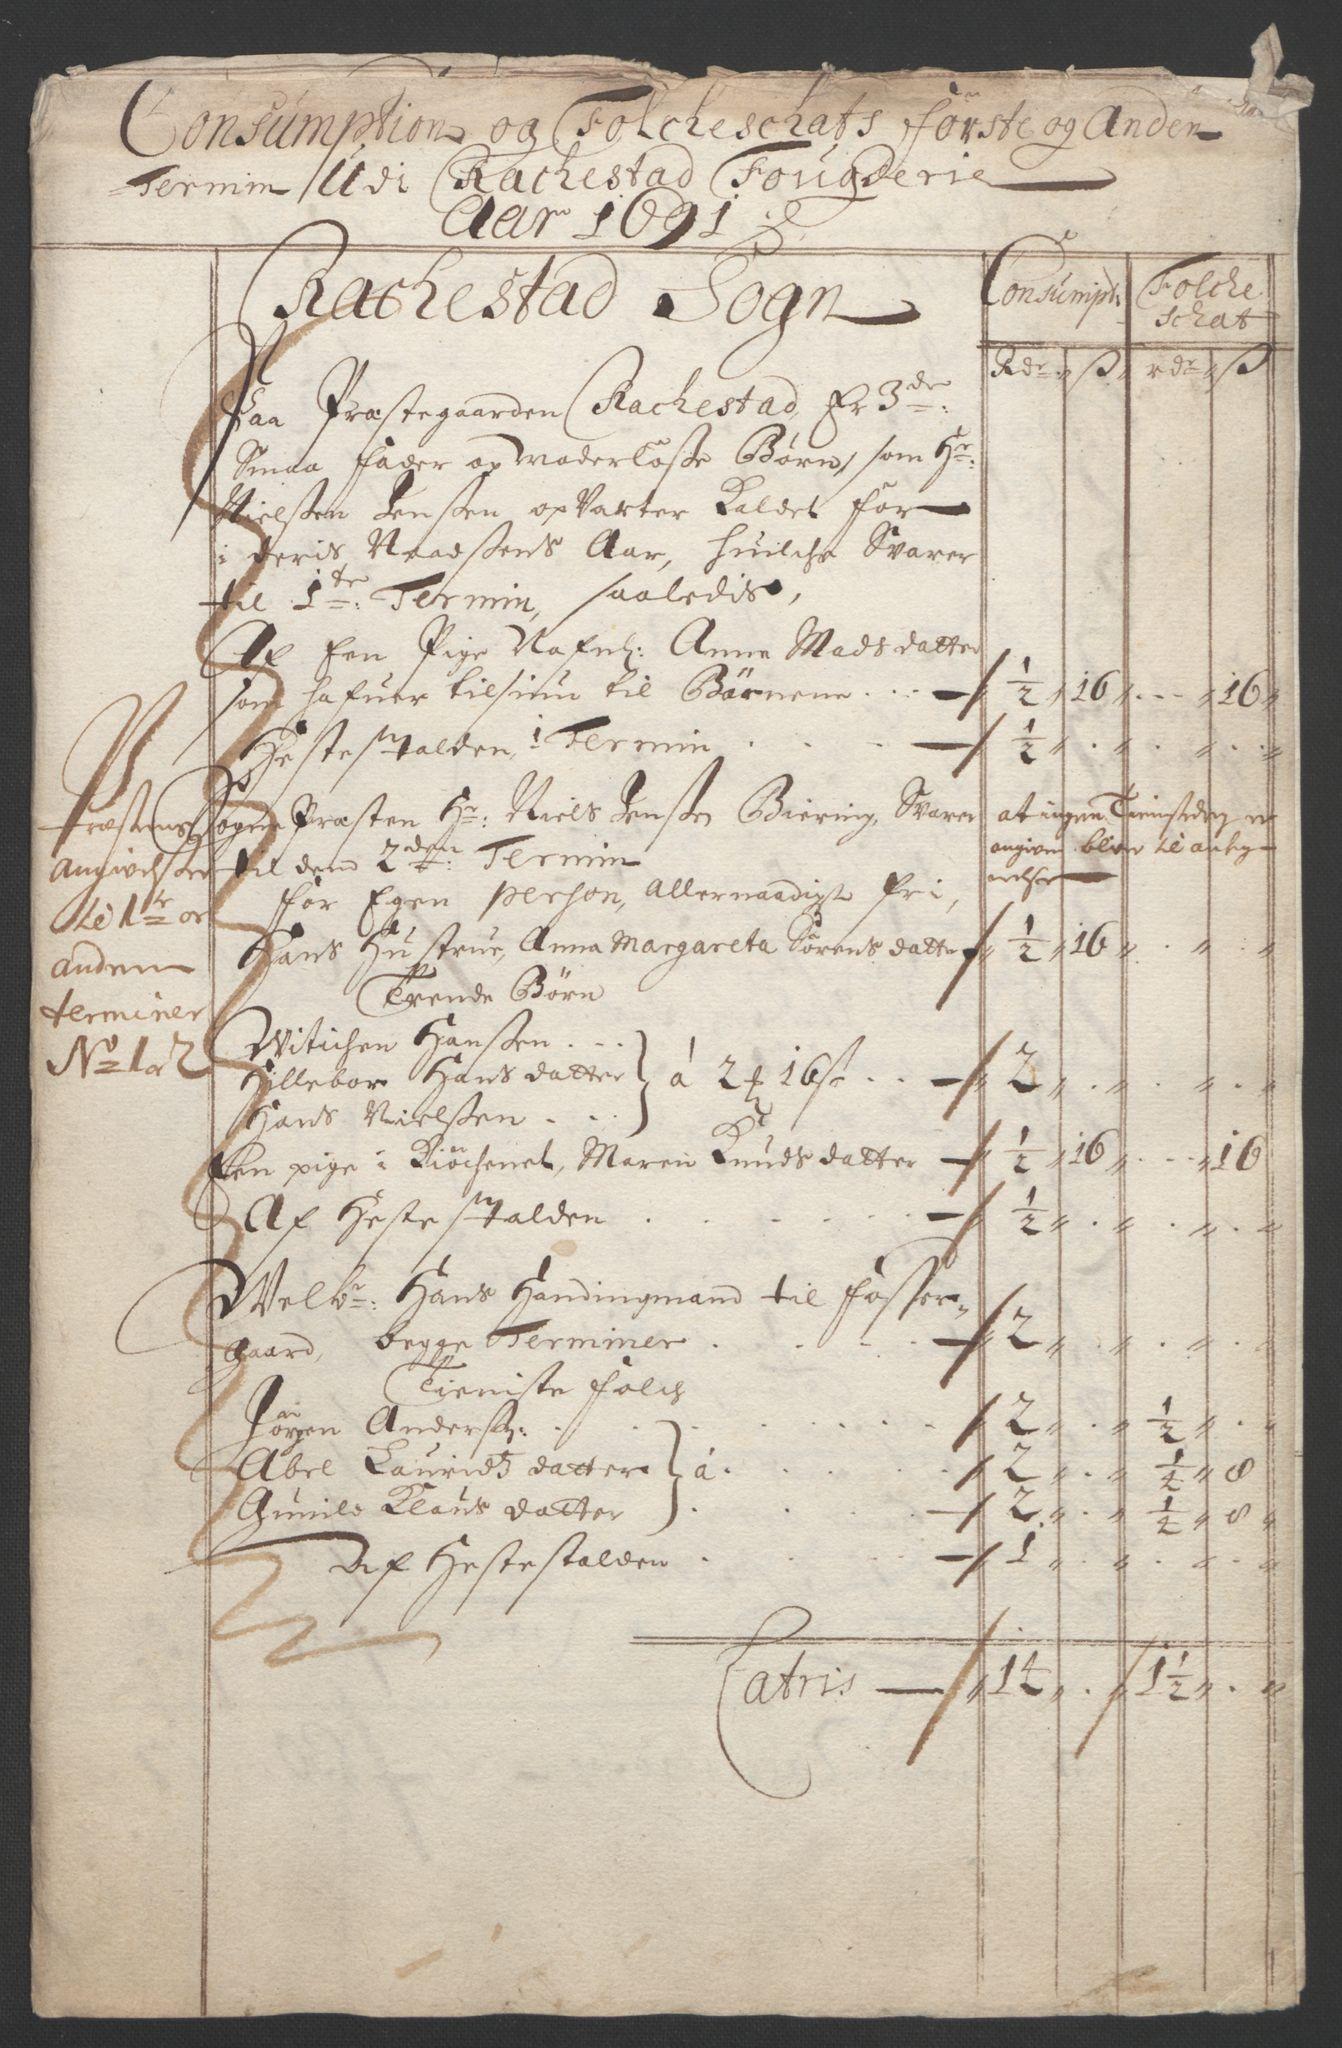 RA, Rentekammeret inntil 1814, Reviderte regnskaper, Fogderegnskap, R05/L0278: Fogderegnskap Rakkestad, 1691-1693, s. 78